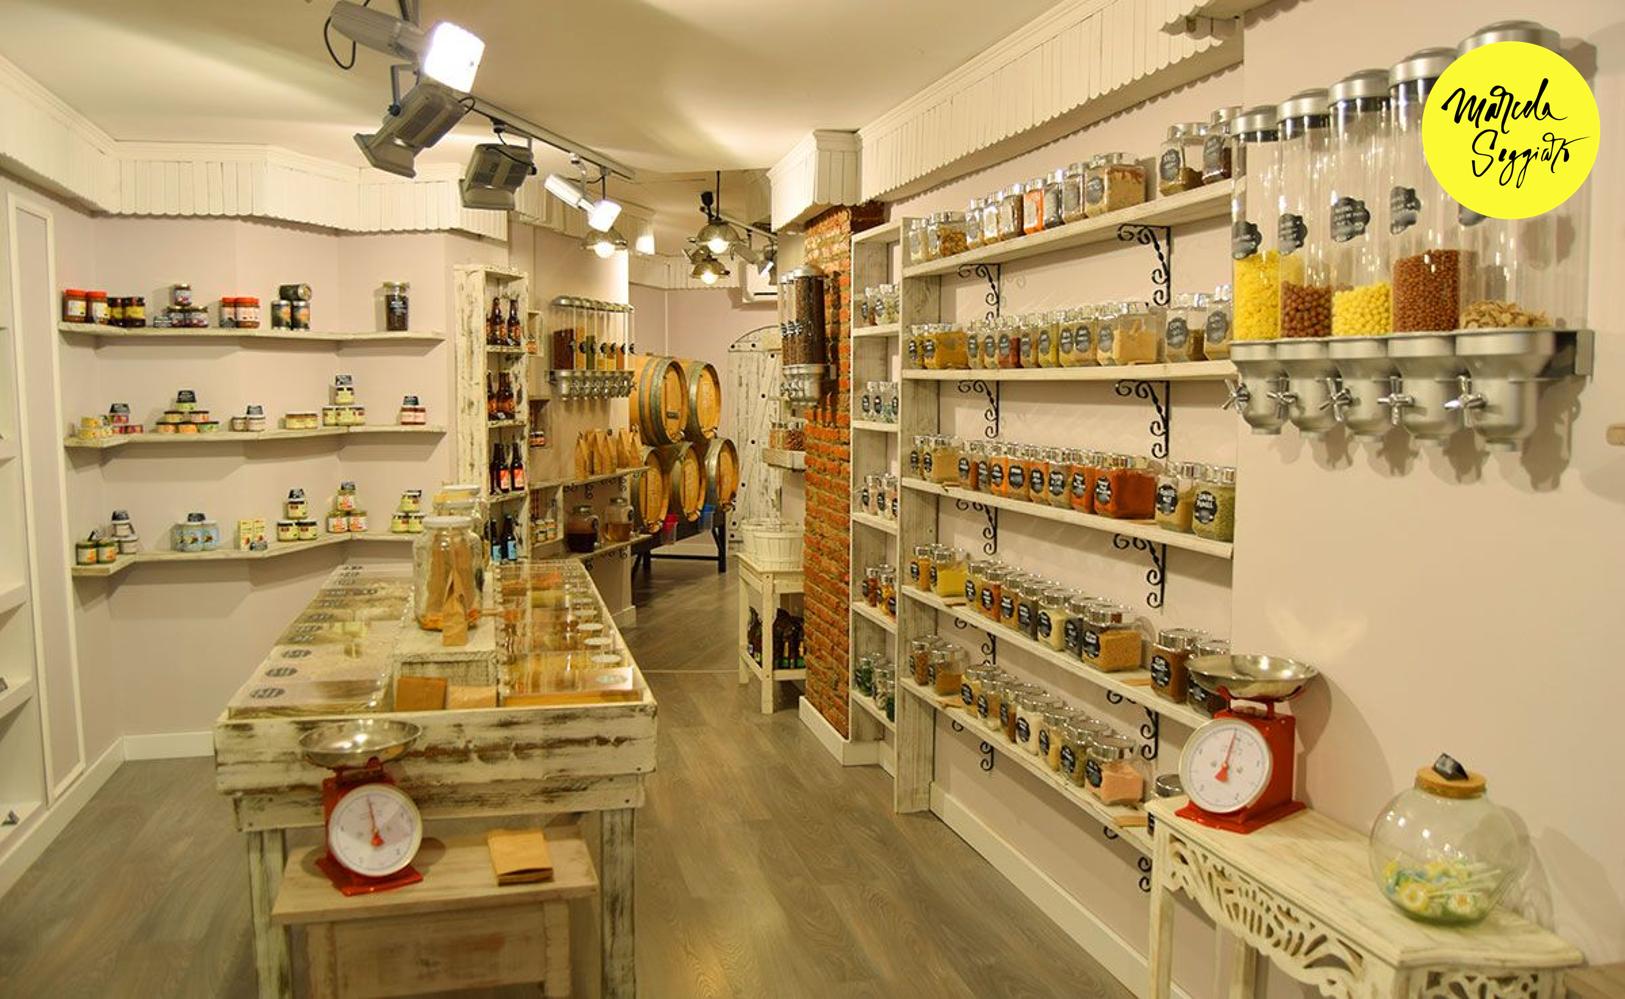 Nuevas Tiendas a granel. Marcela Seggiaro